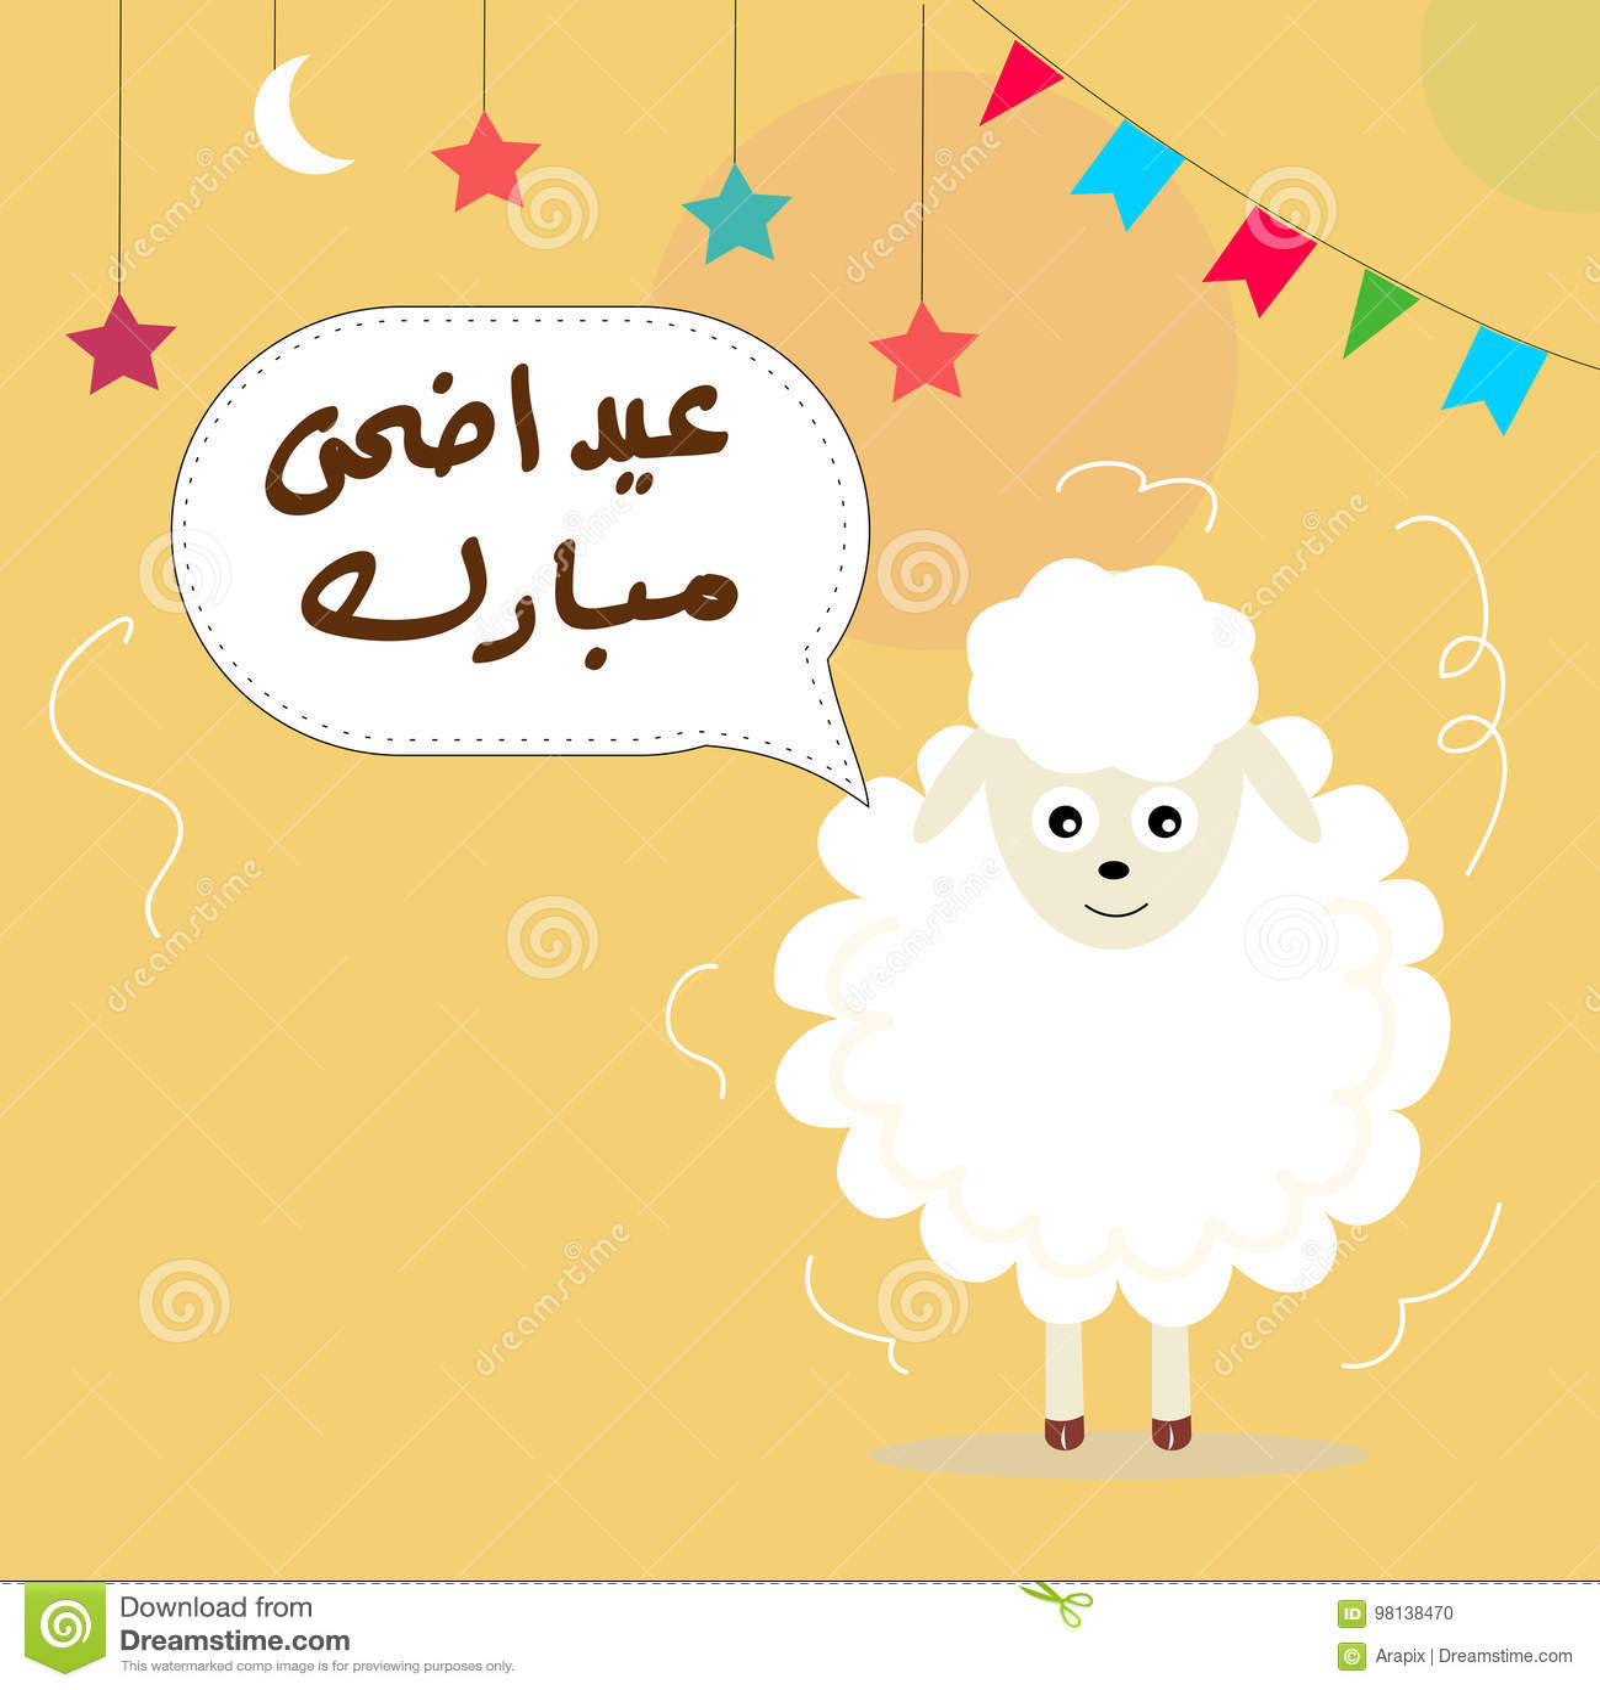 Eid saeed greeting card translation happy feast arabic t download eid saeed greeting card translation happy feast arabic t stock vector m4hsunfo